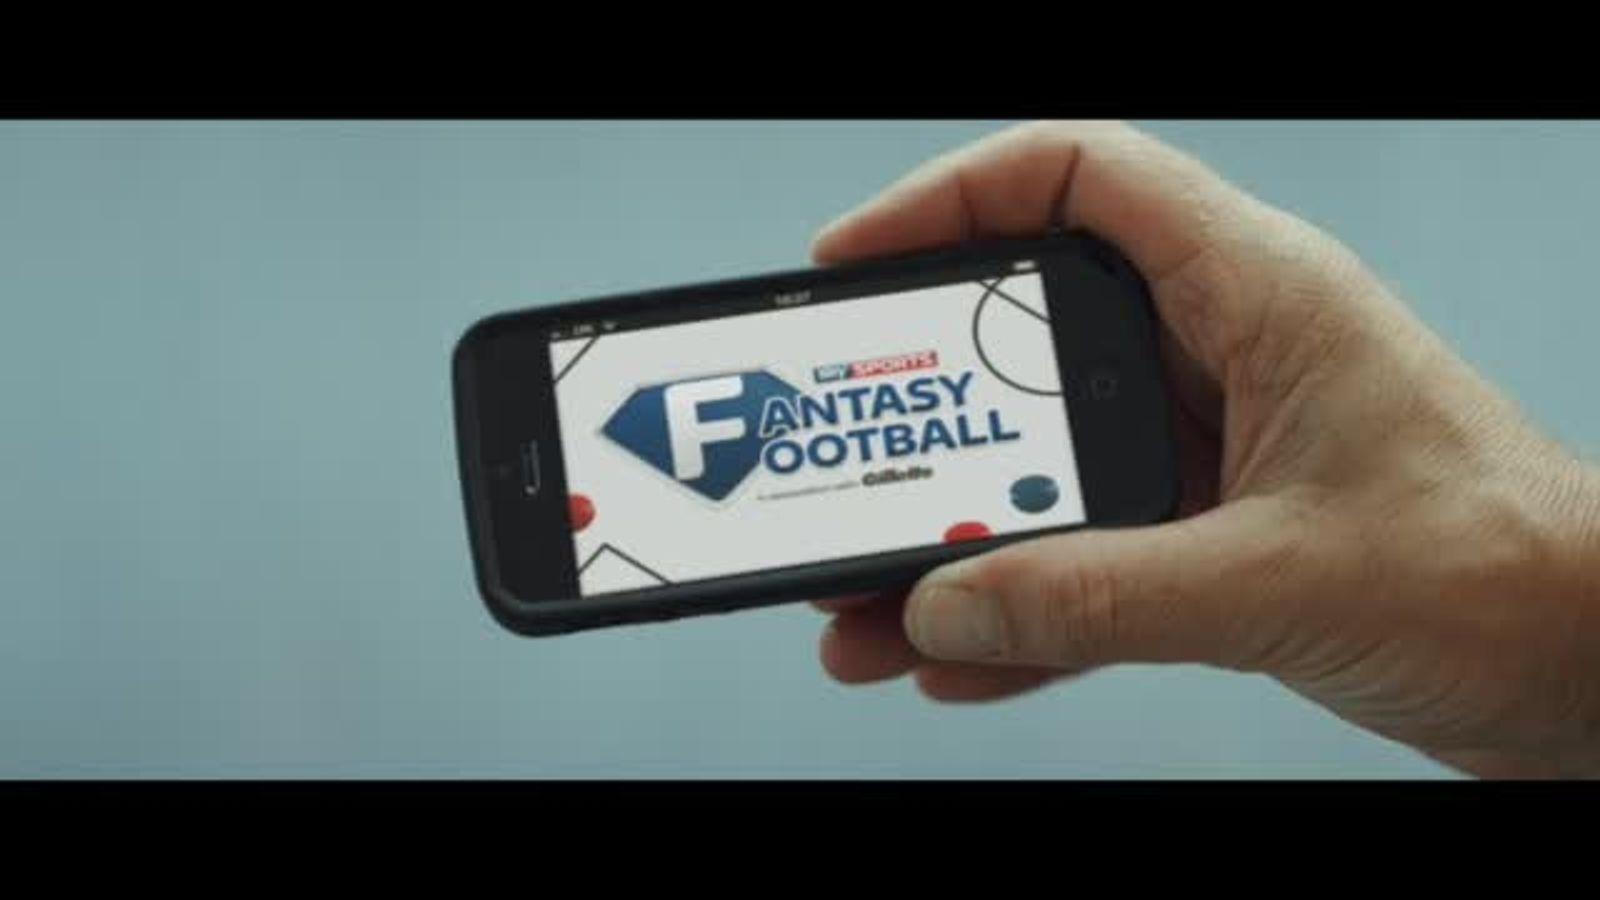 Sky Bet Fantasy Football